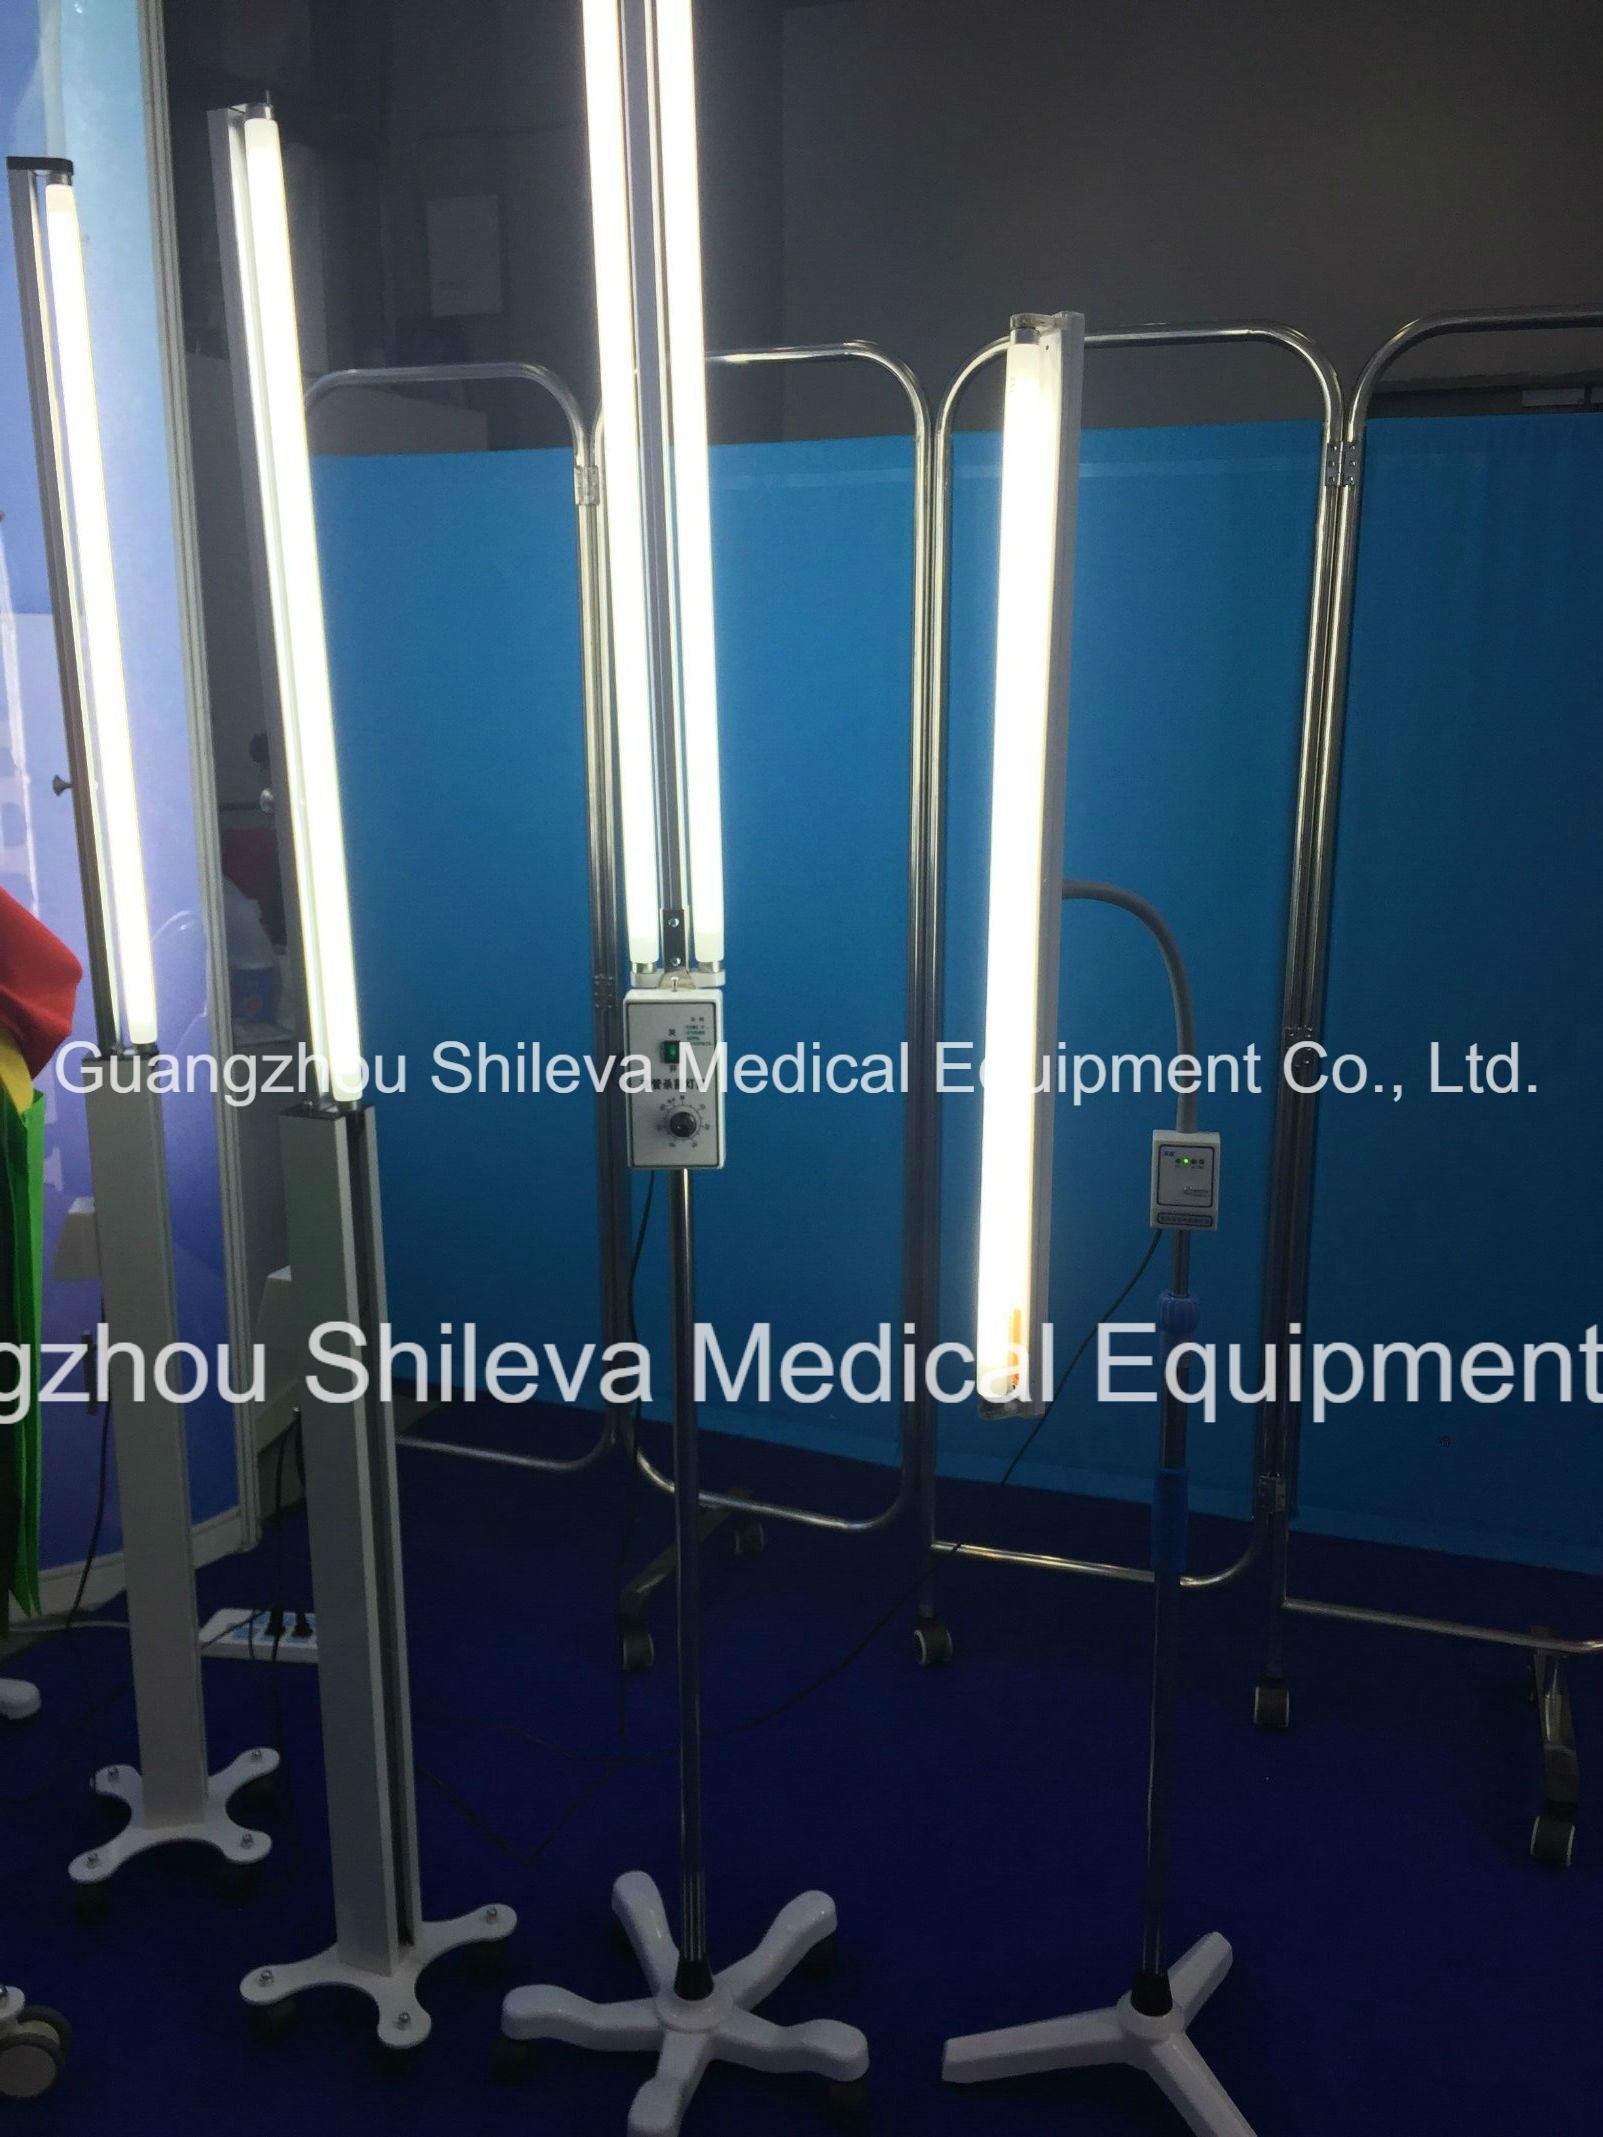 Hot Item Ce 2 30w Uv Lamp Trolley Mobile Uv Sterilization Cart For Hospital Operation Room